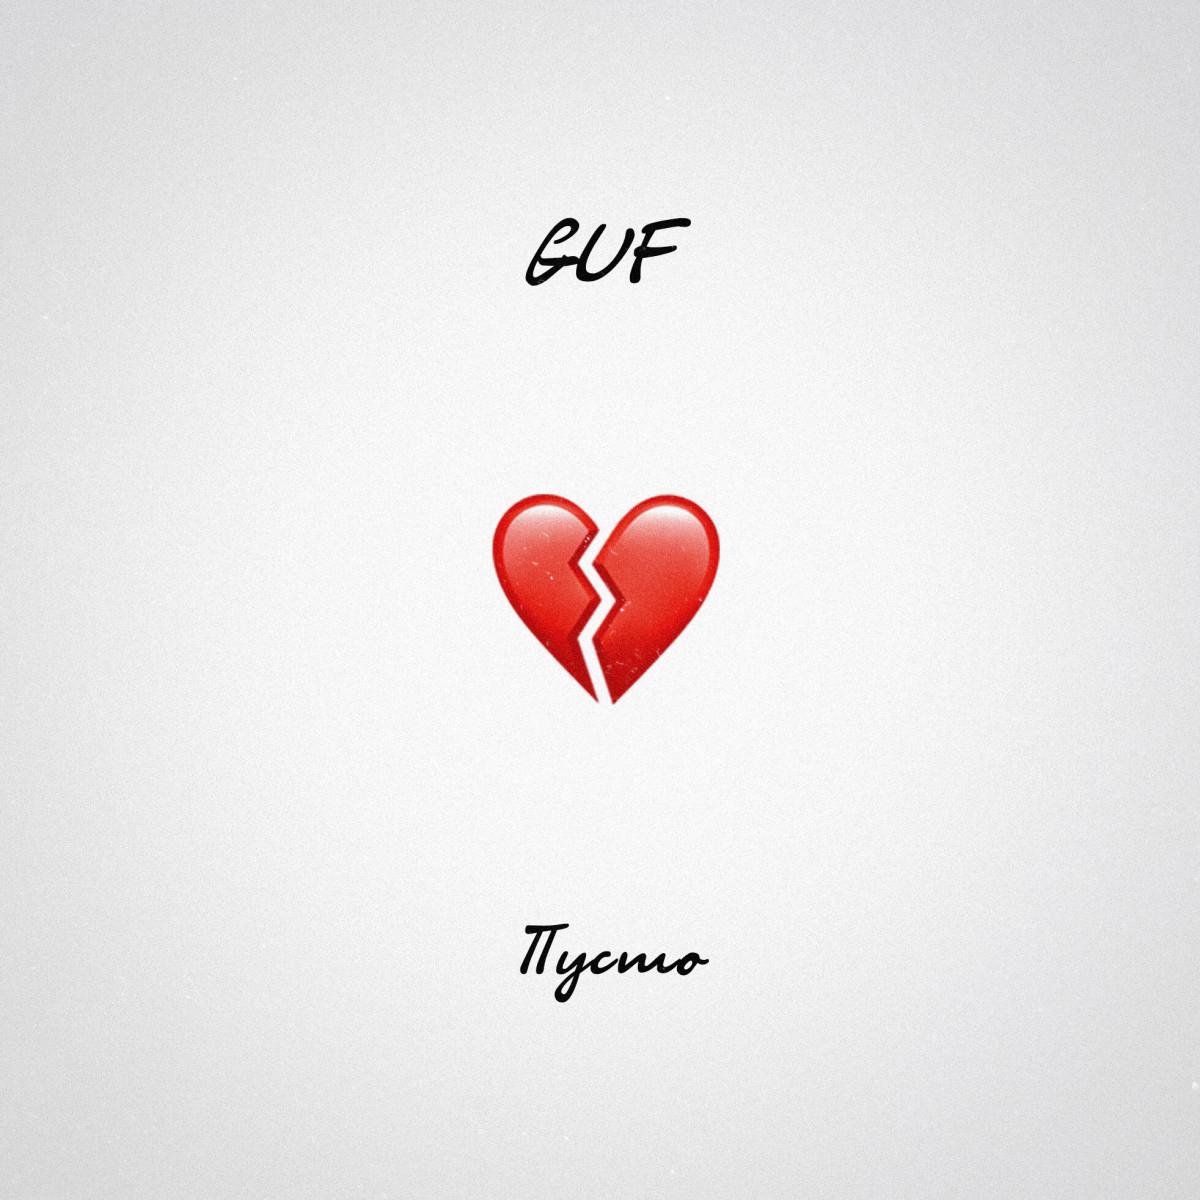 Guf — «Пусто»